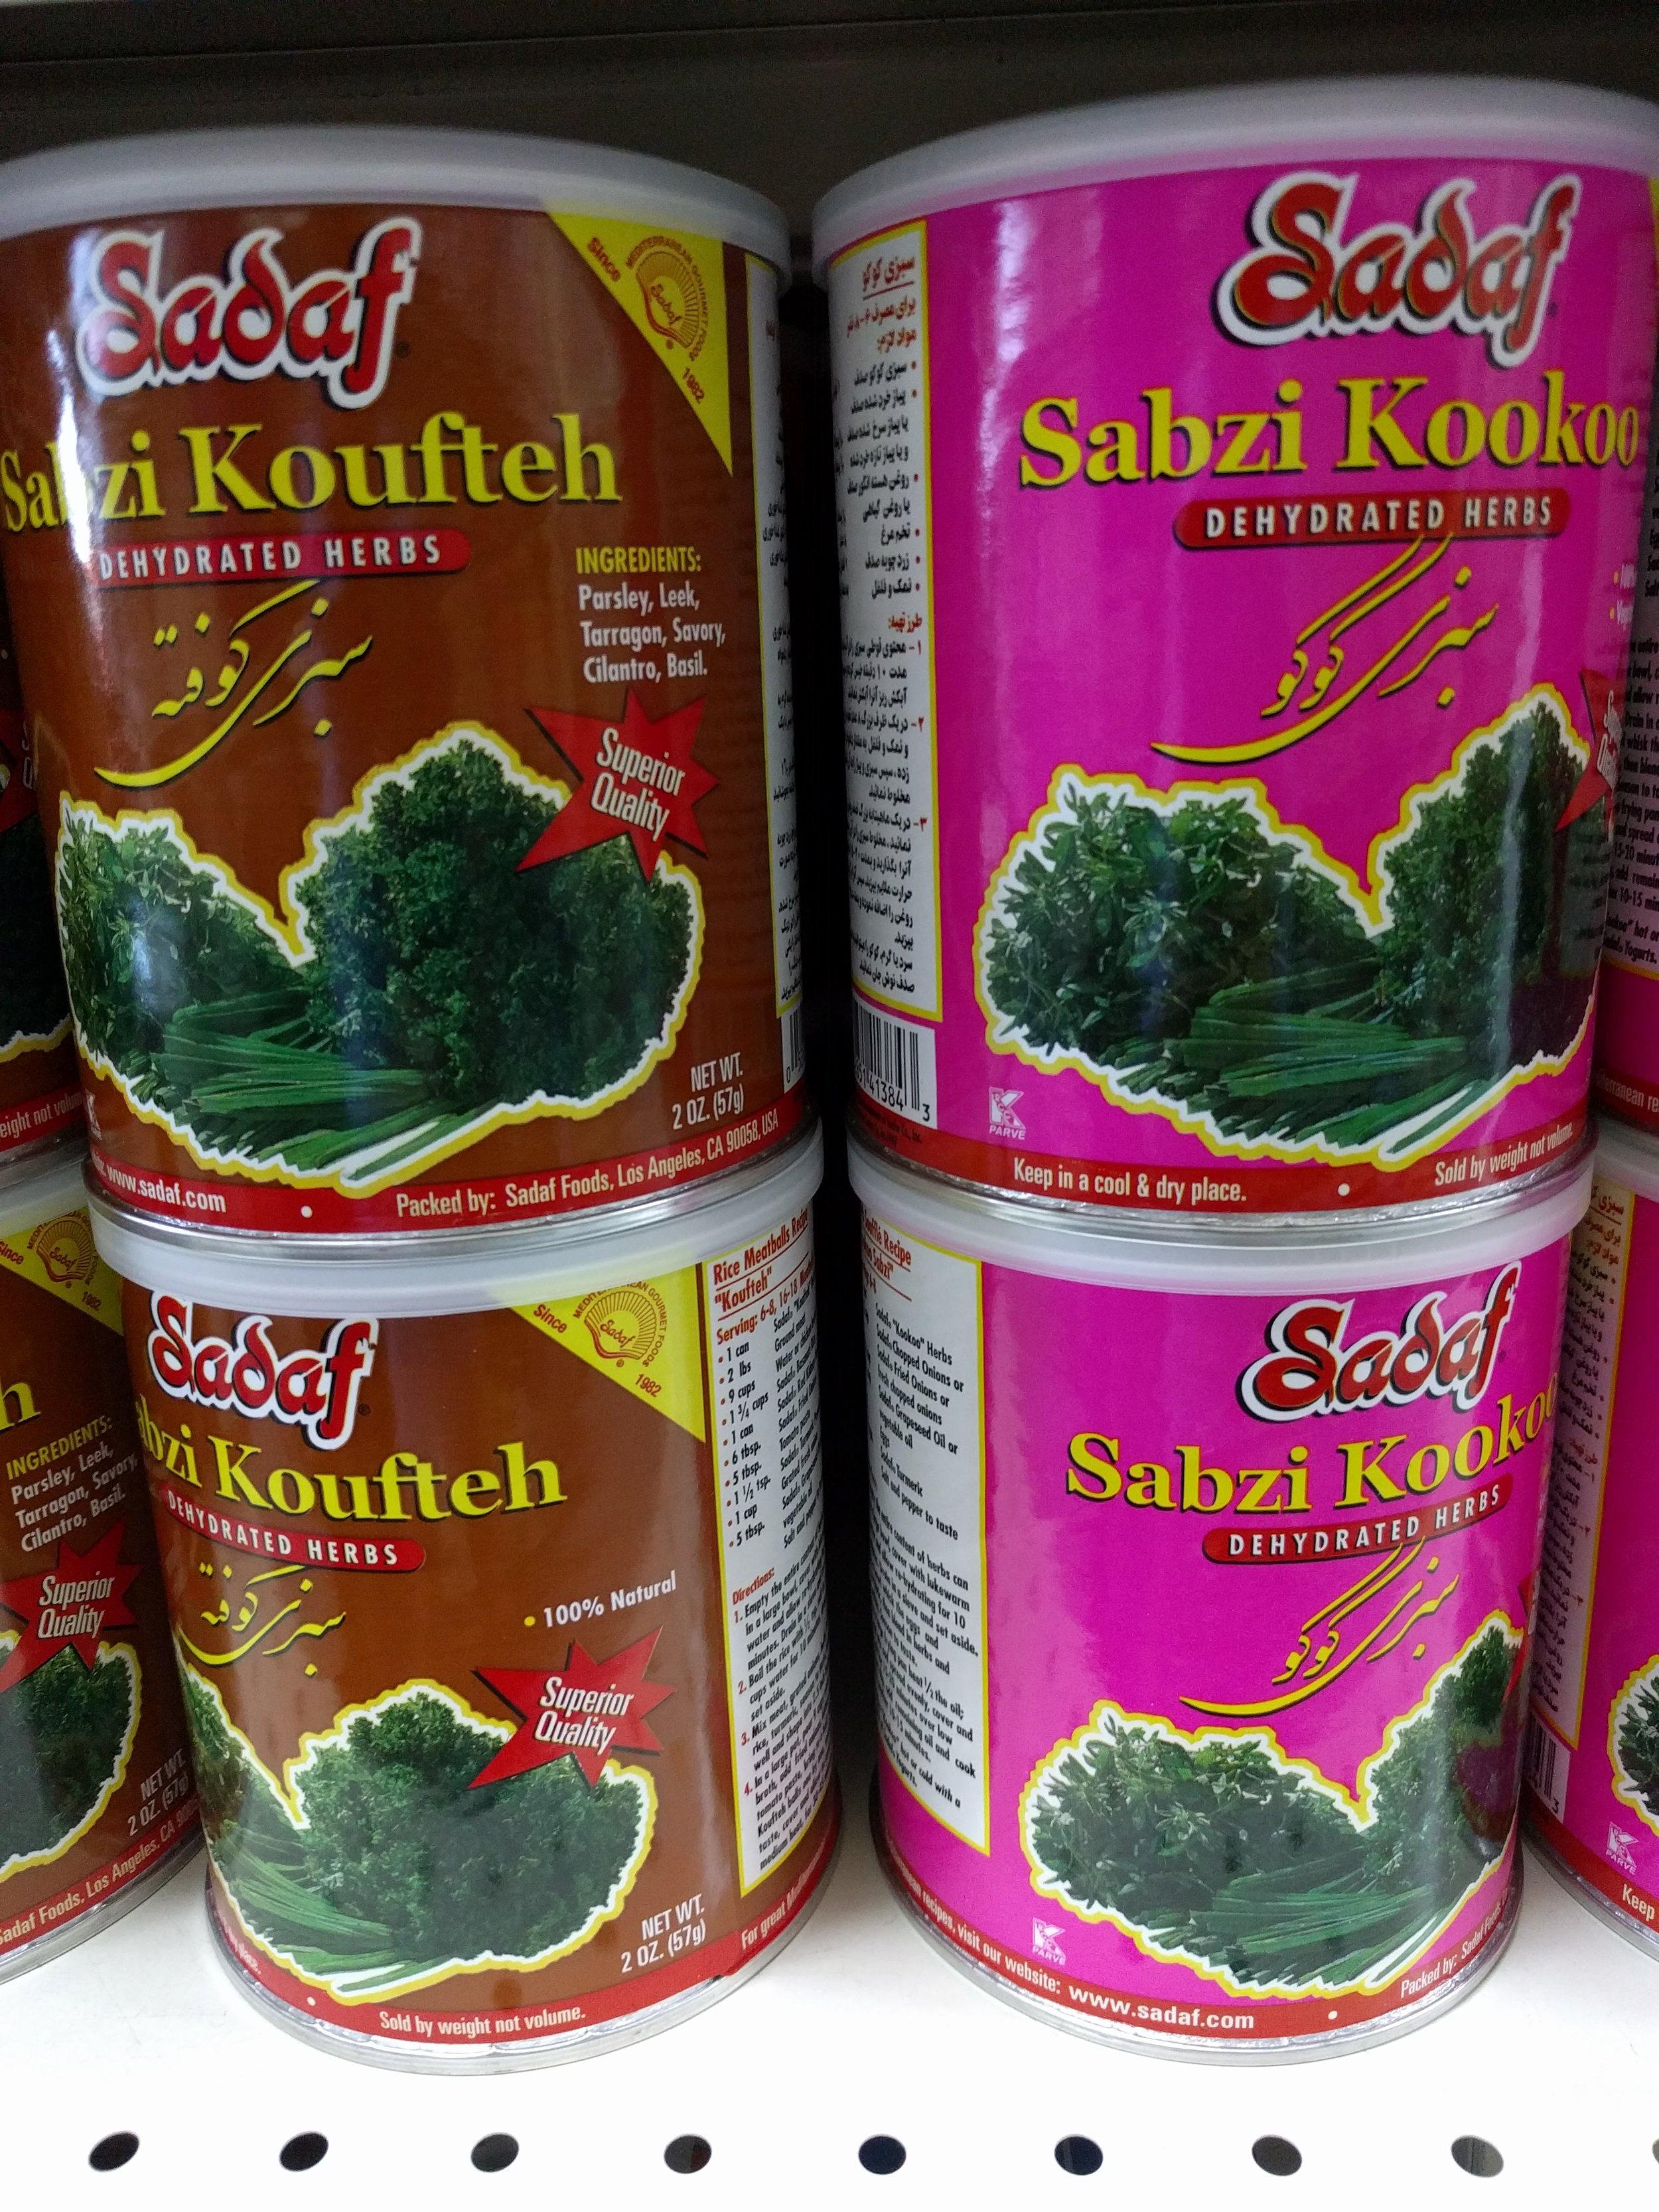 Sadaf-saturated-herbs-Pak-Halal-International-Foods-12259-W-87th-St-Pkwy-Lenexa-KS-66215-2.jpg